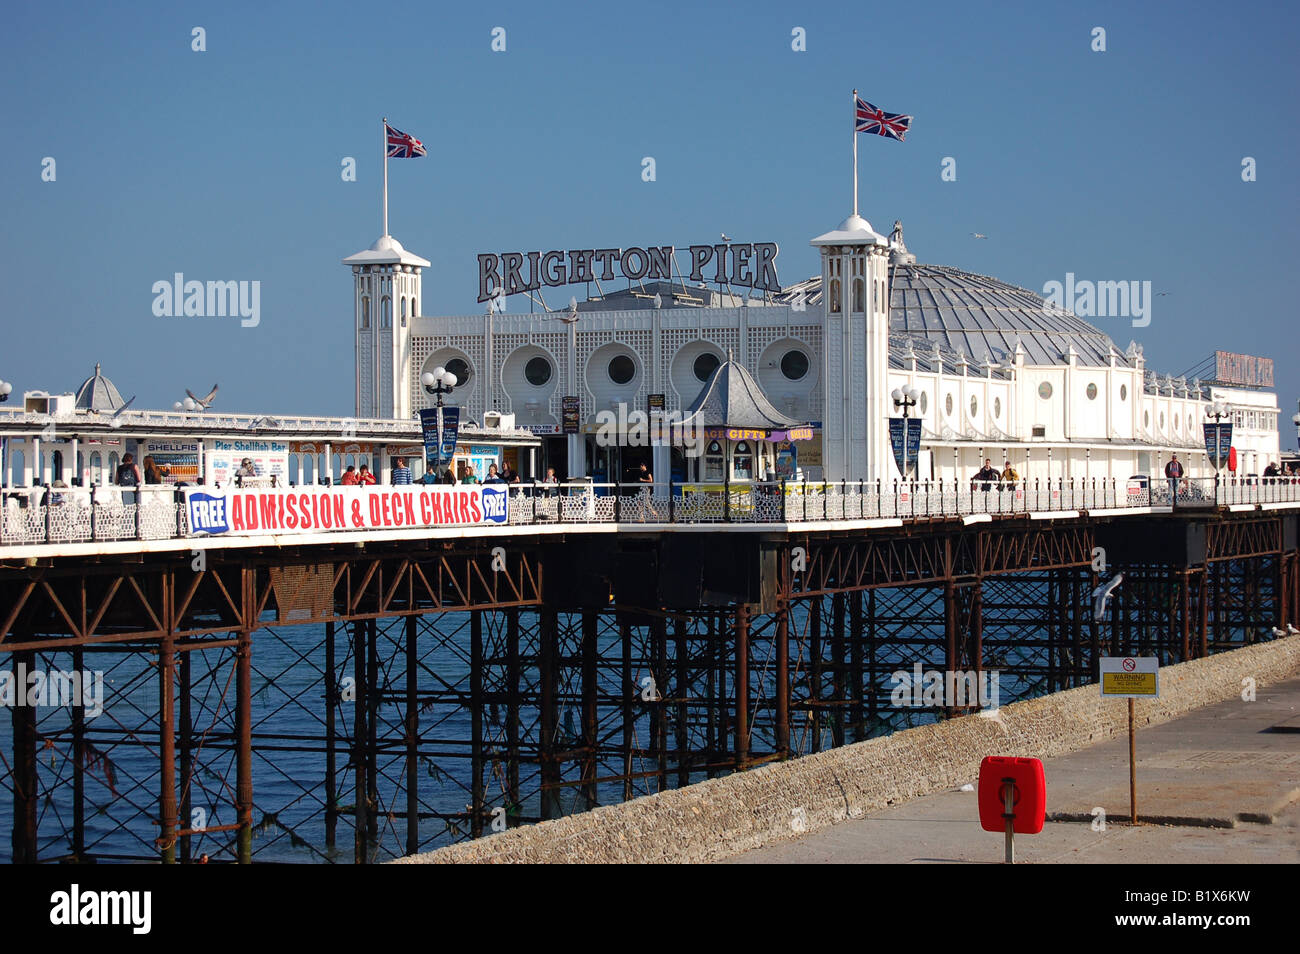 Brighton Pier, East Sussex, England - Stock Image